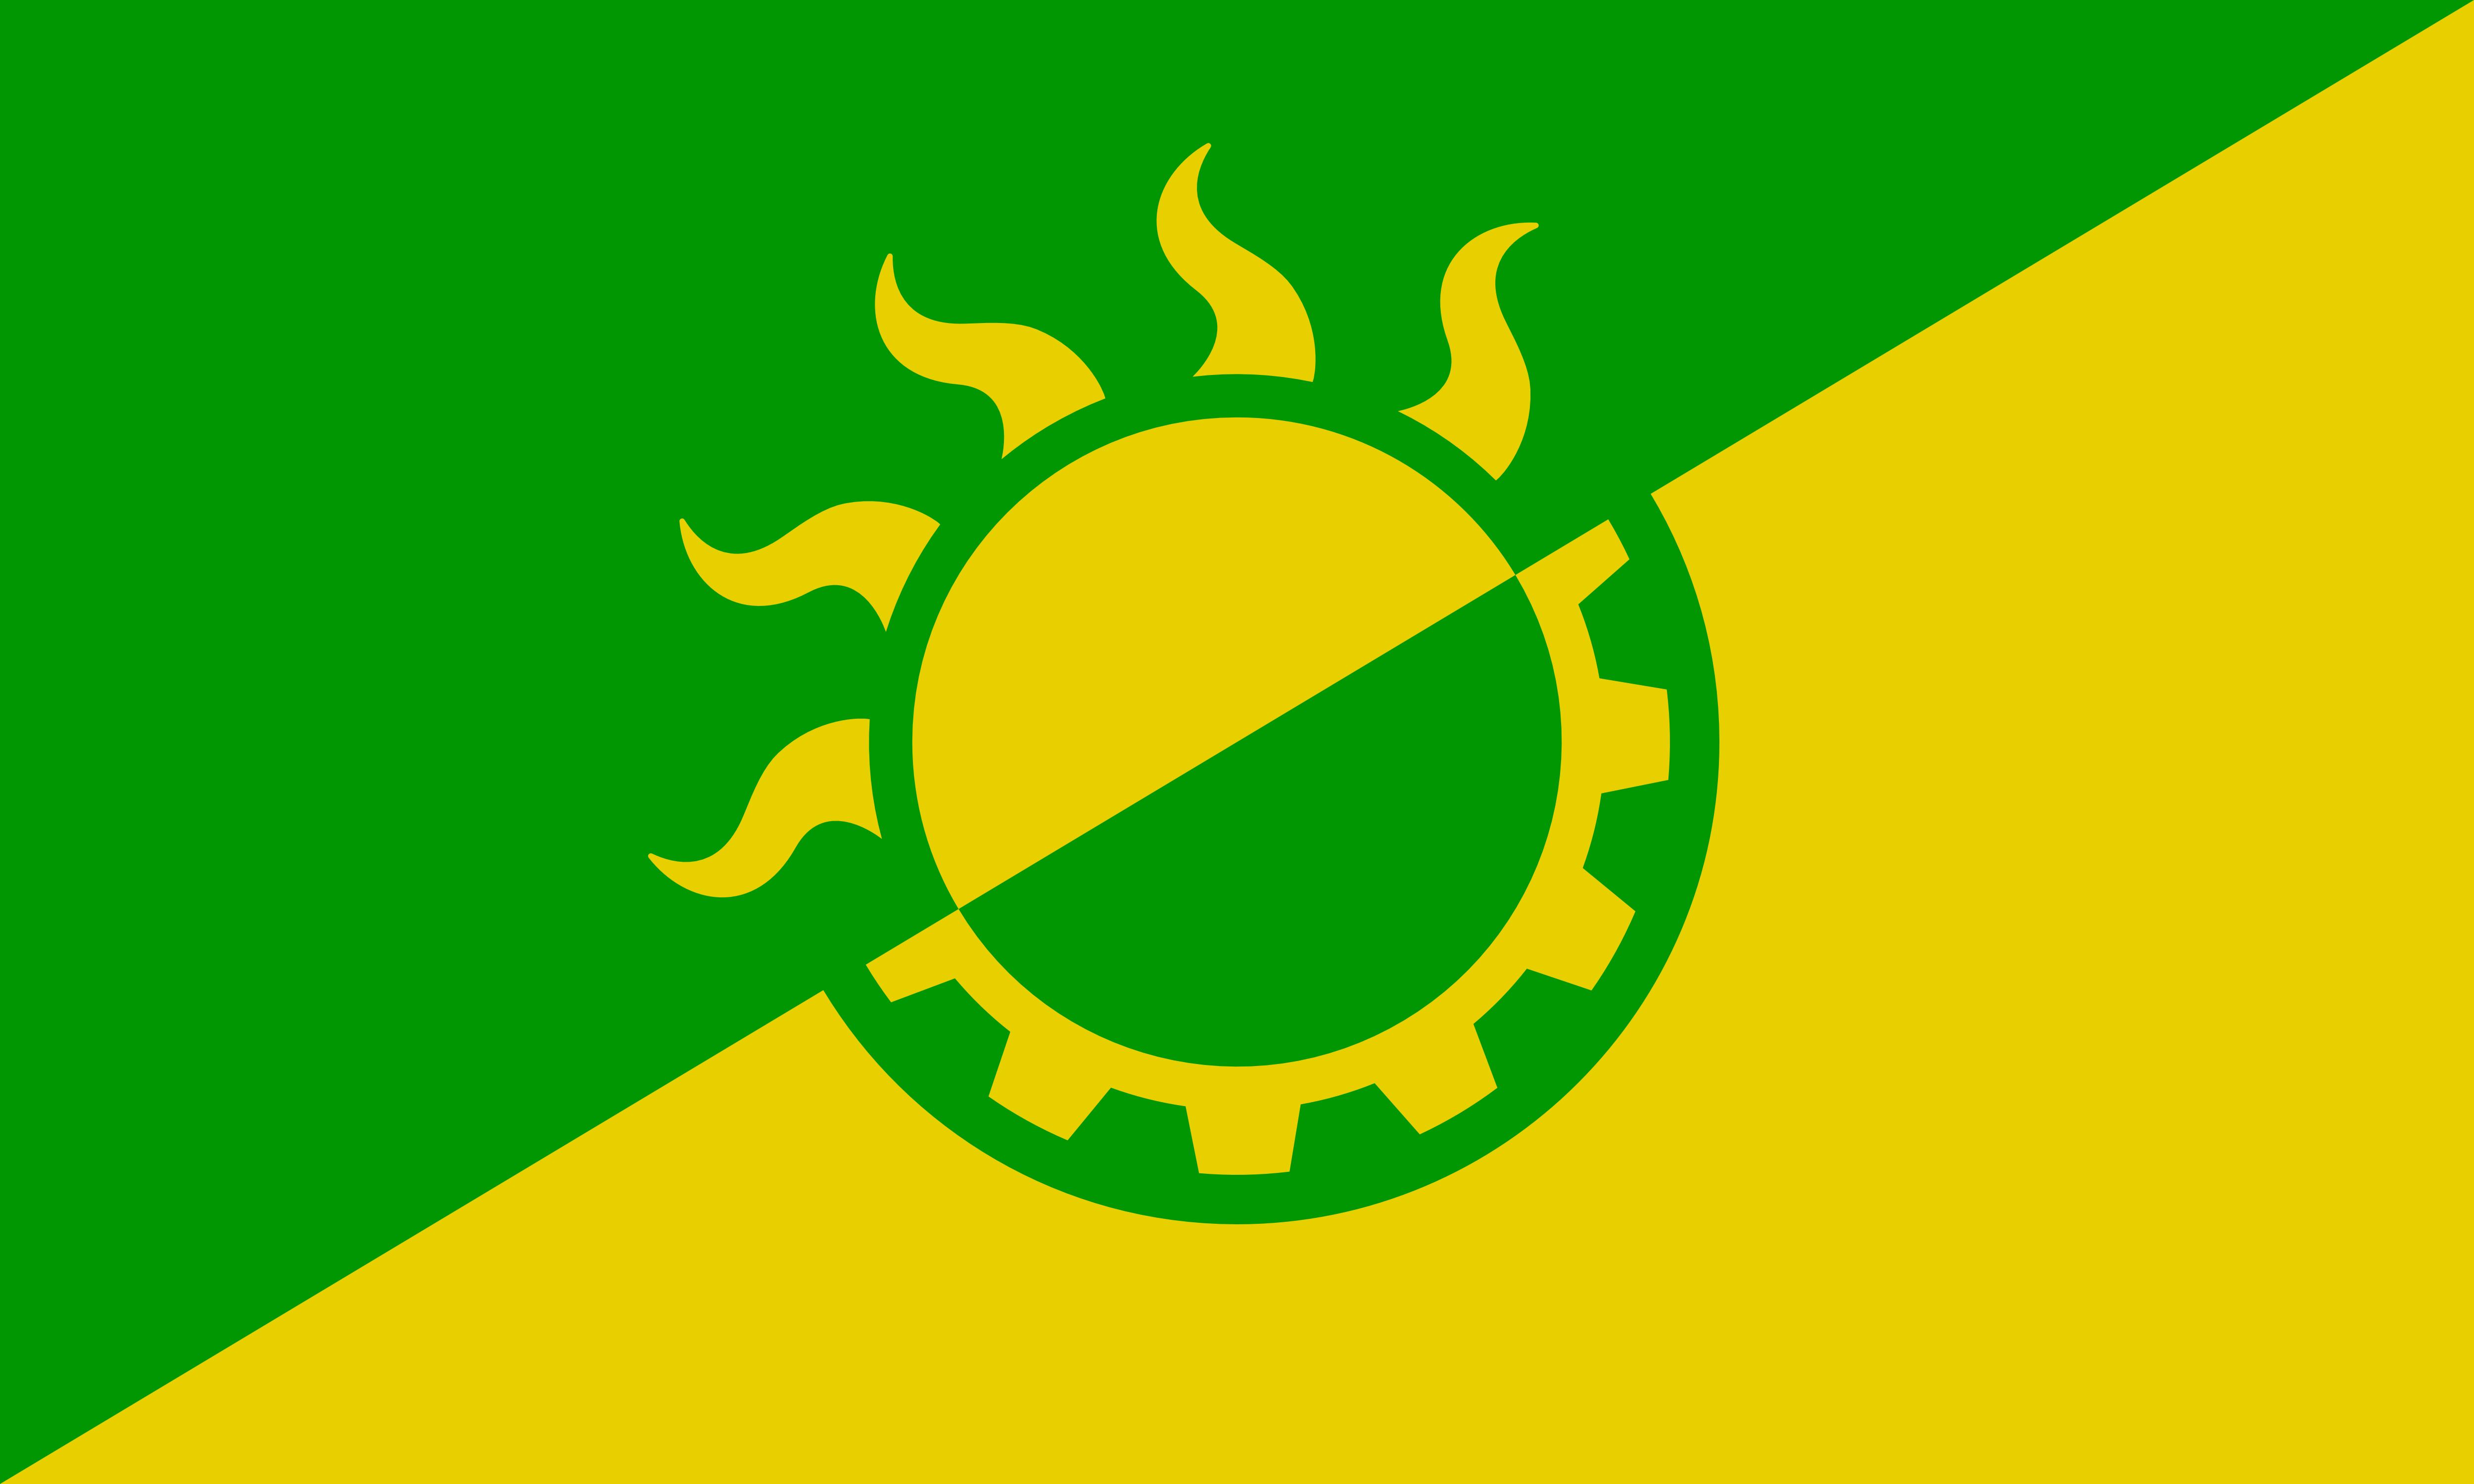 Flaga solarpunka, StarwallOfRadical.town via wikimedia commons